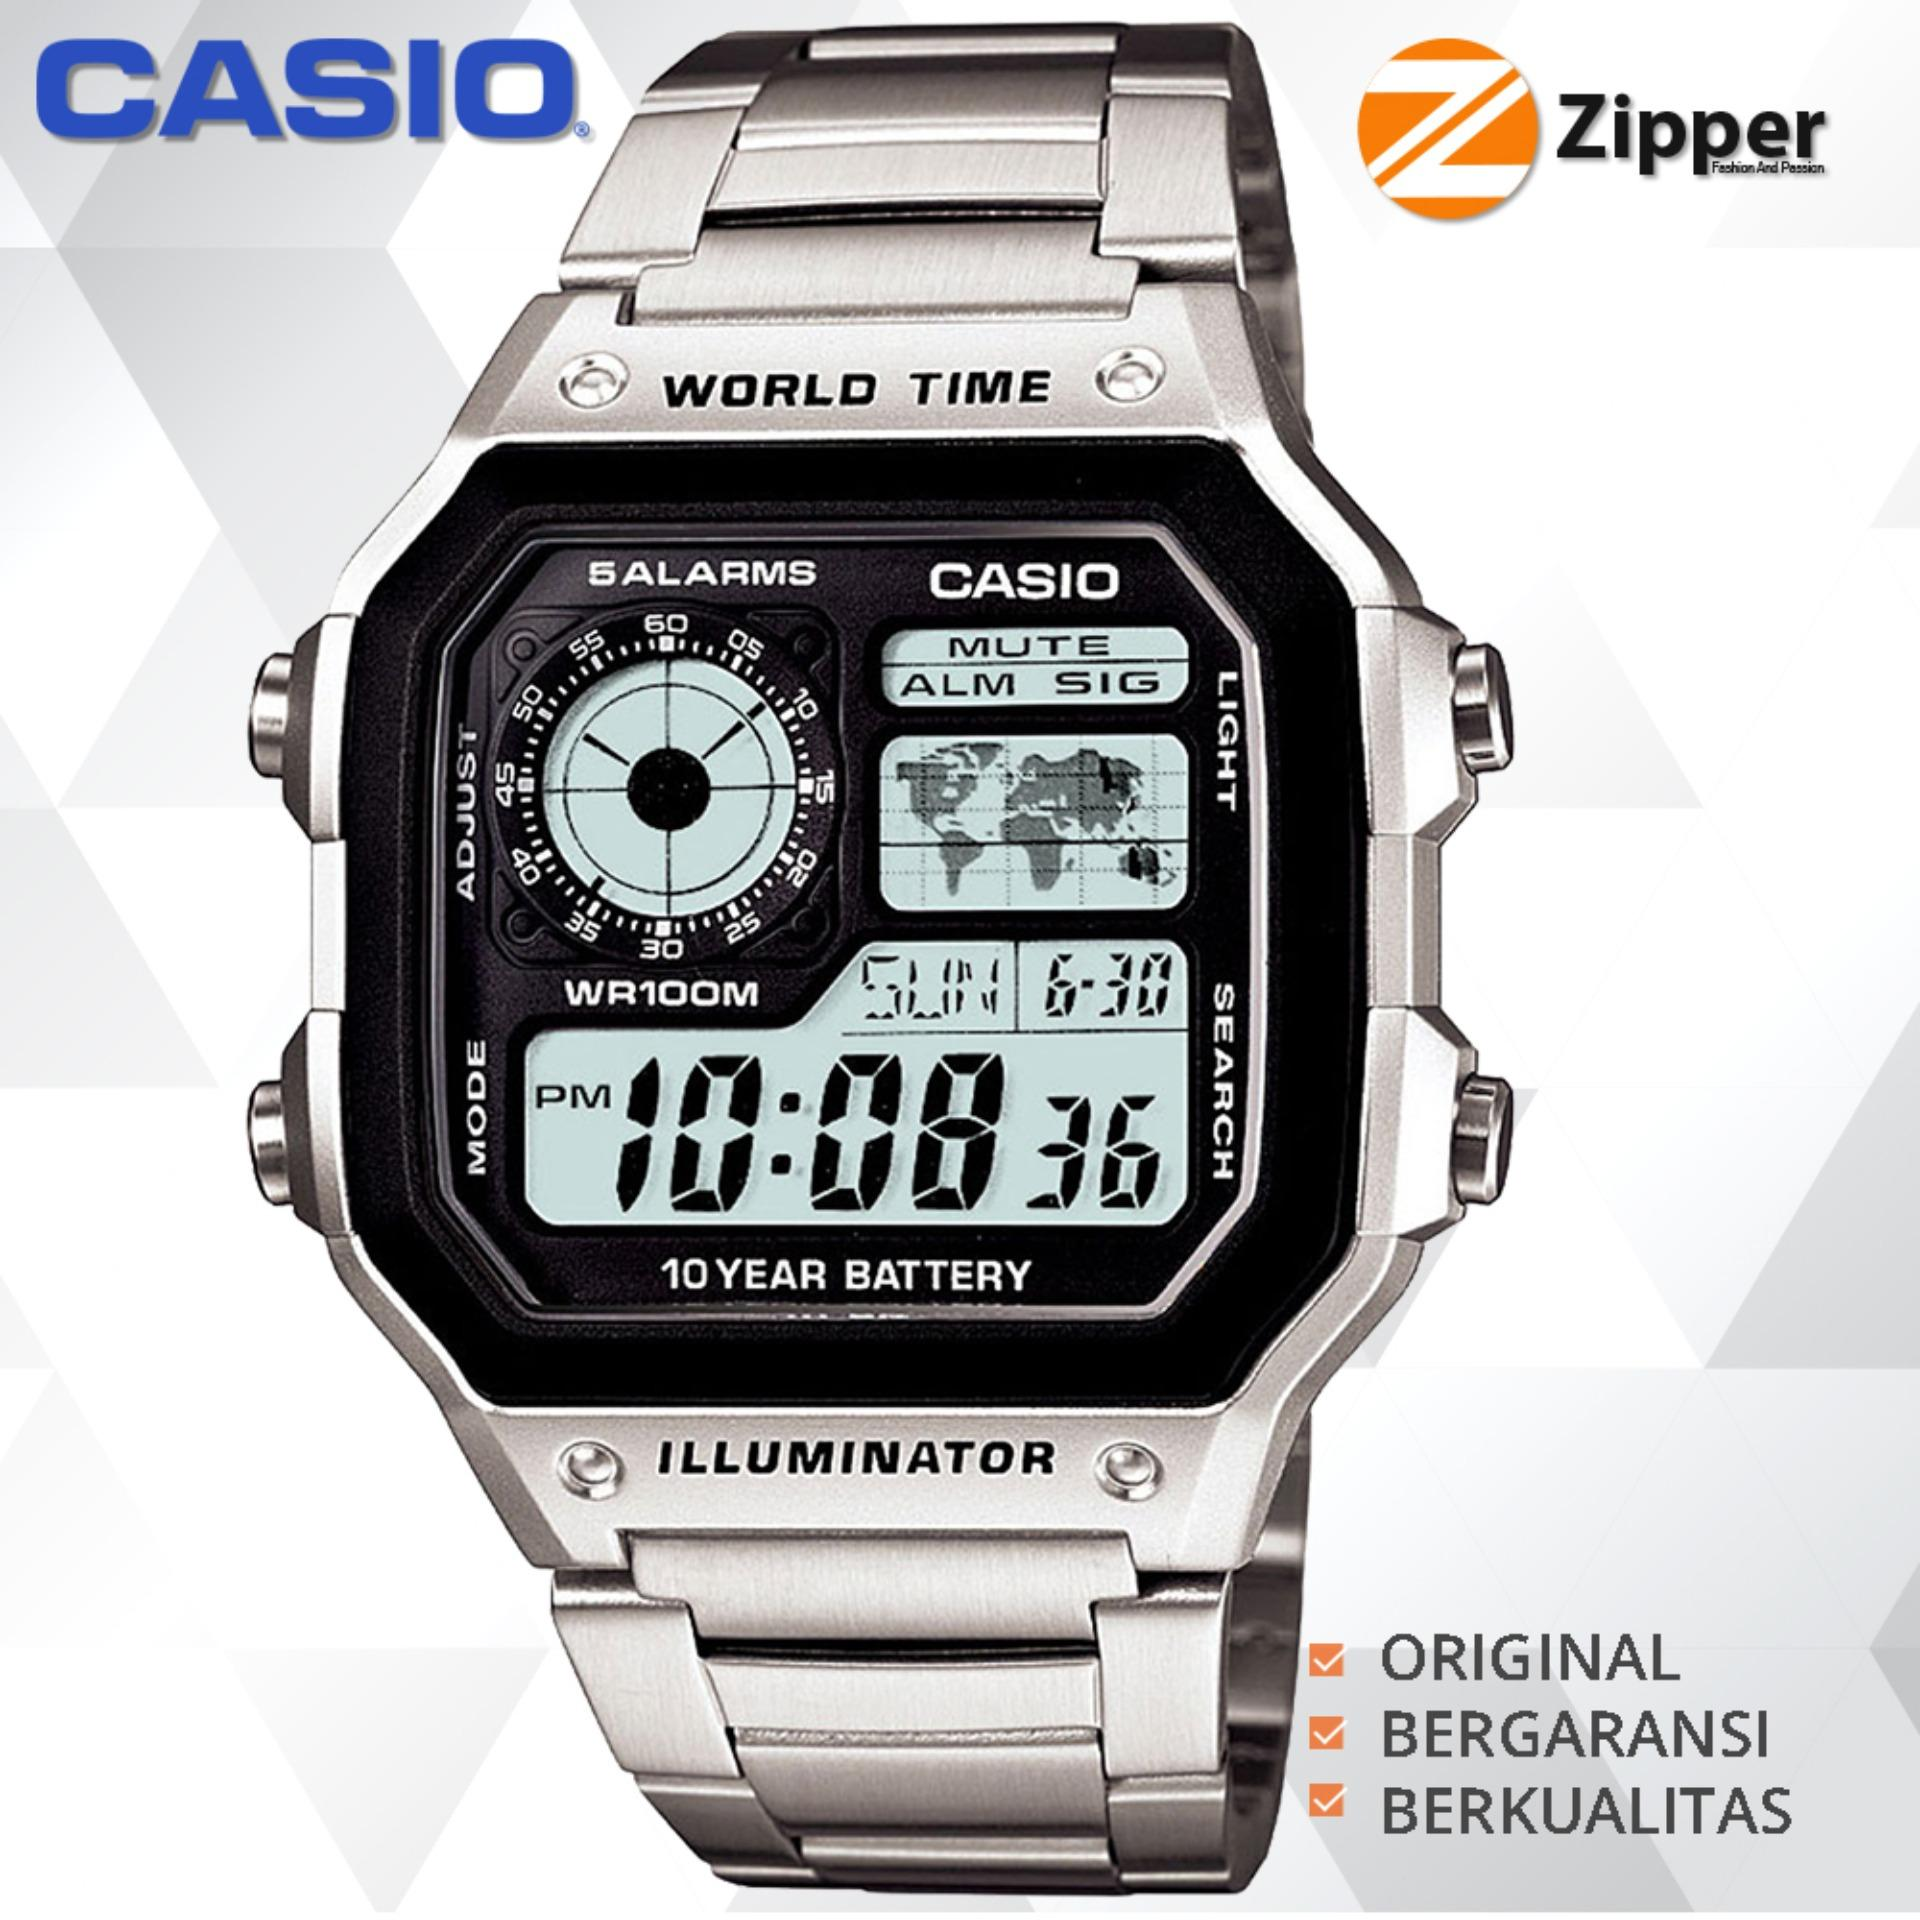 Casio Illuminator Jam Tangan Digital AE-1200WHD-1AVDF Youth Series - Tali Stainless Steel Promo